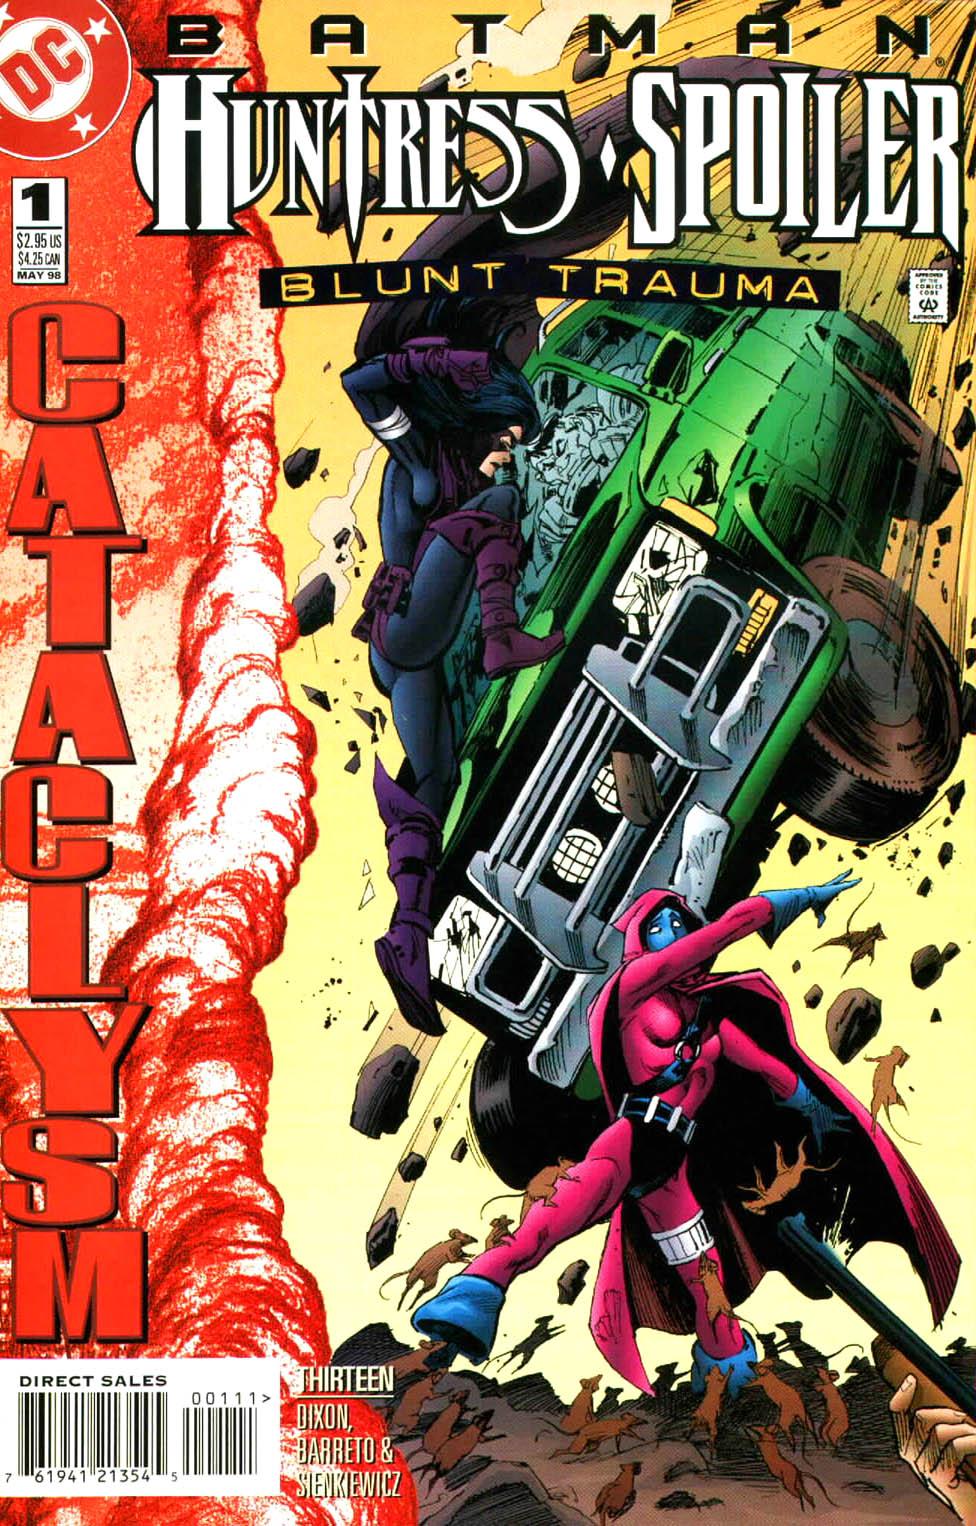 Batman: Huntress & Spoiler Vol 1 1